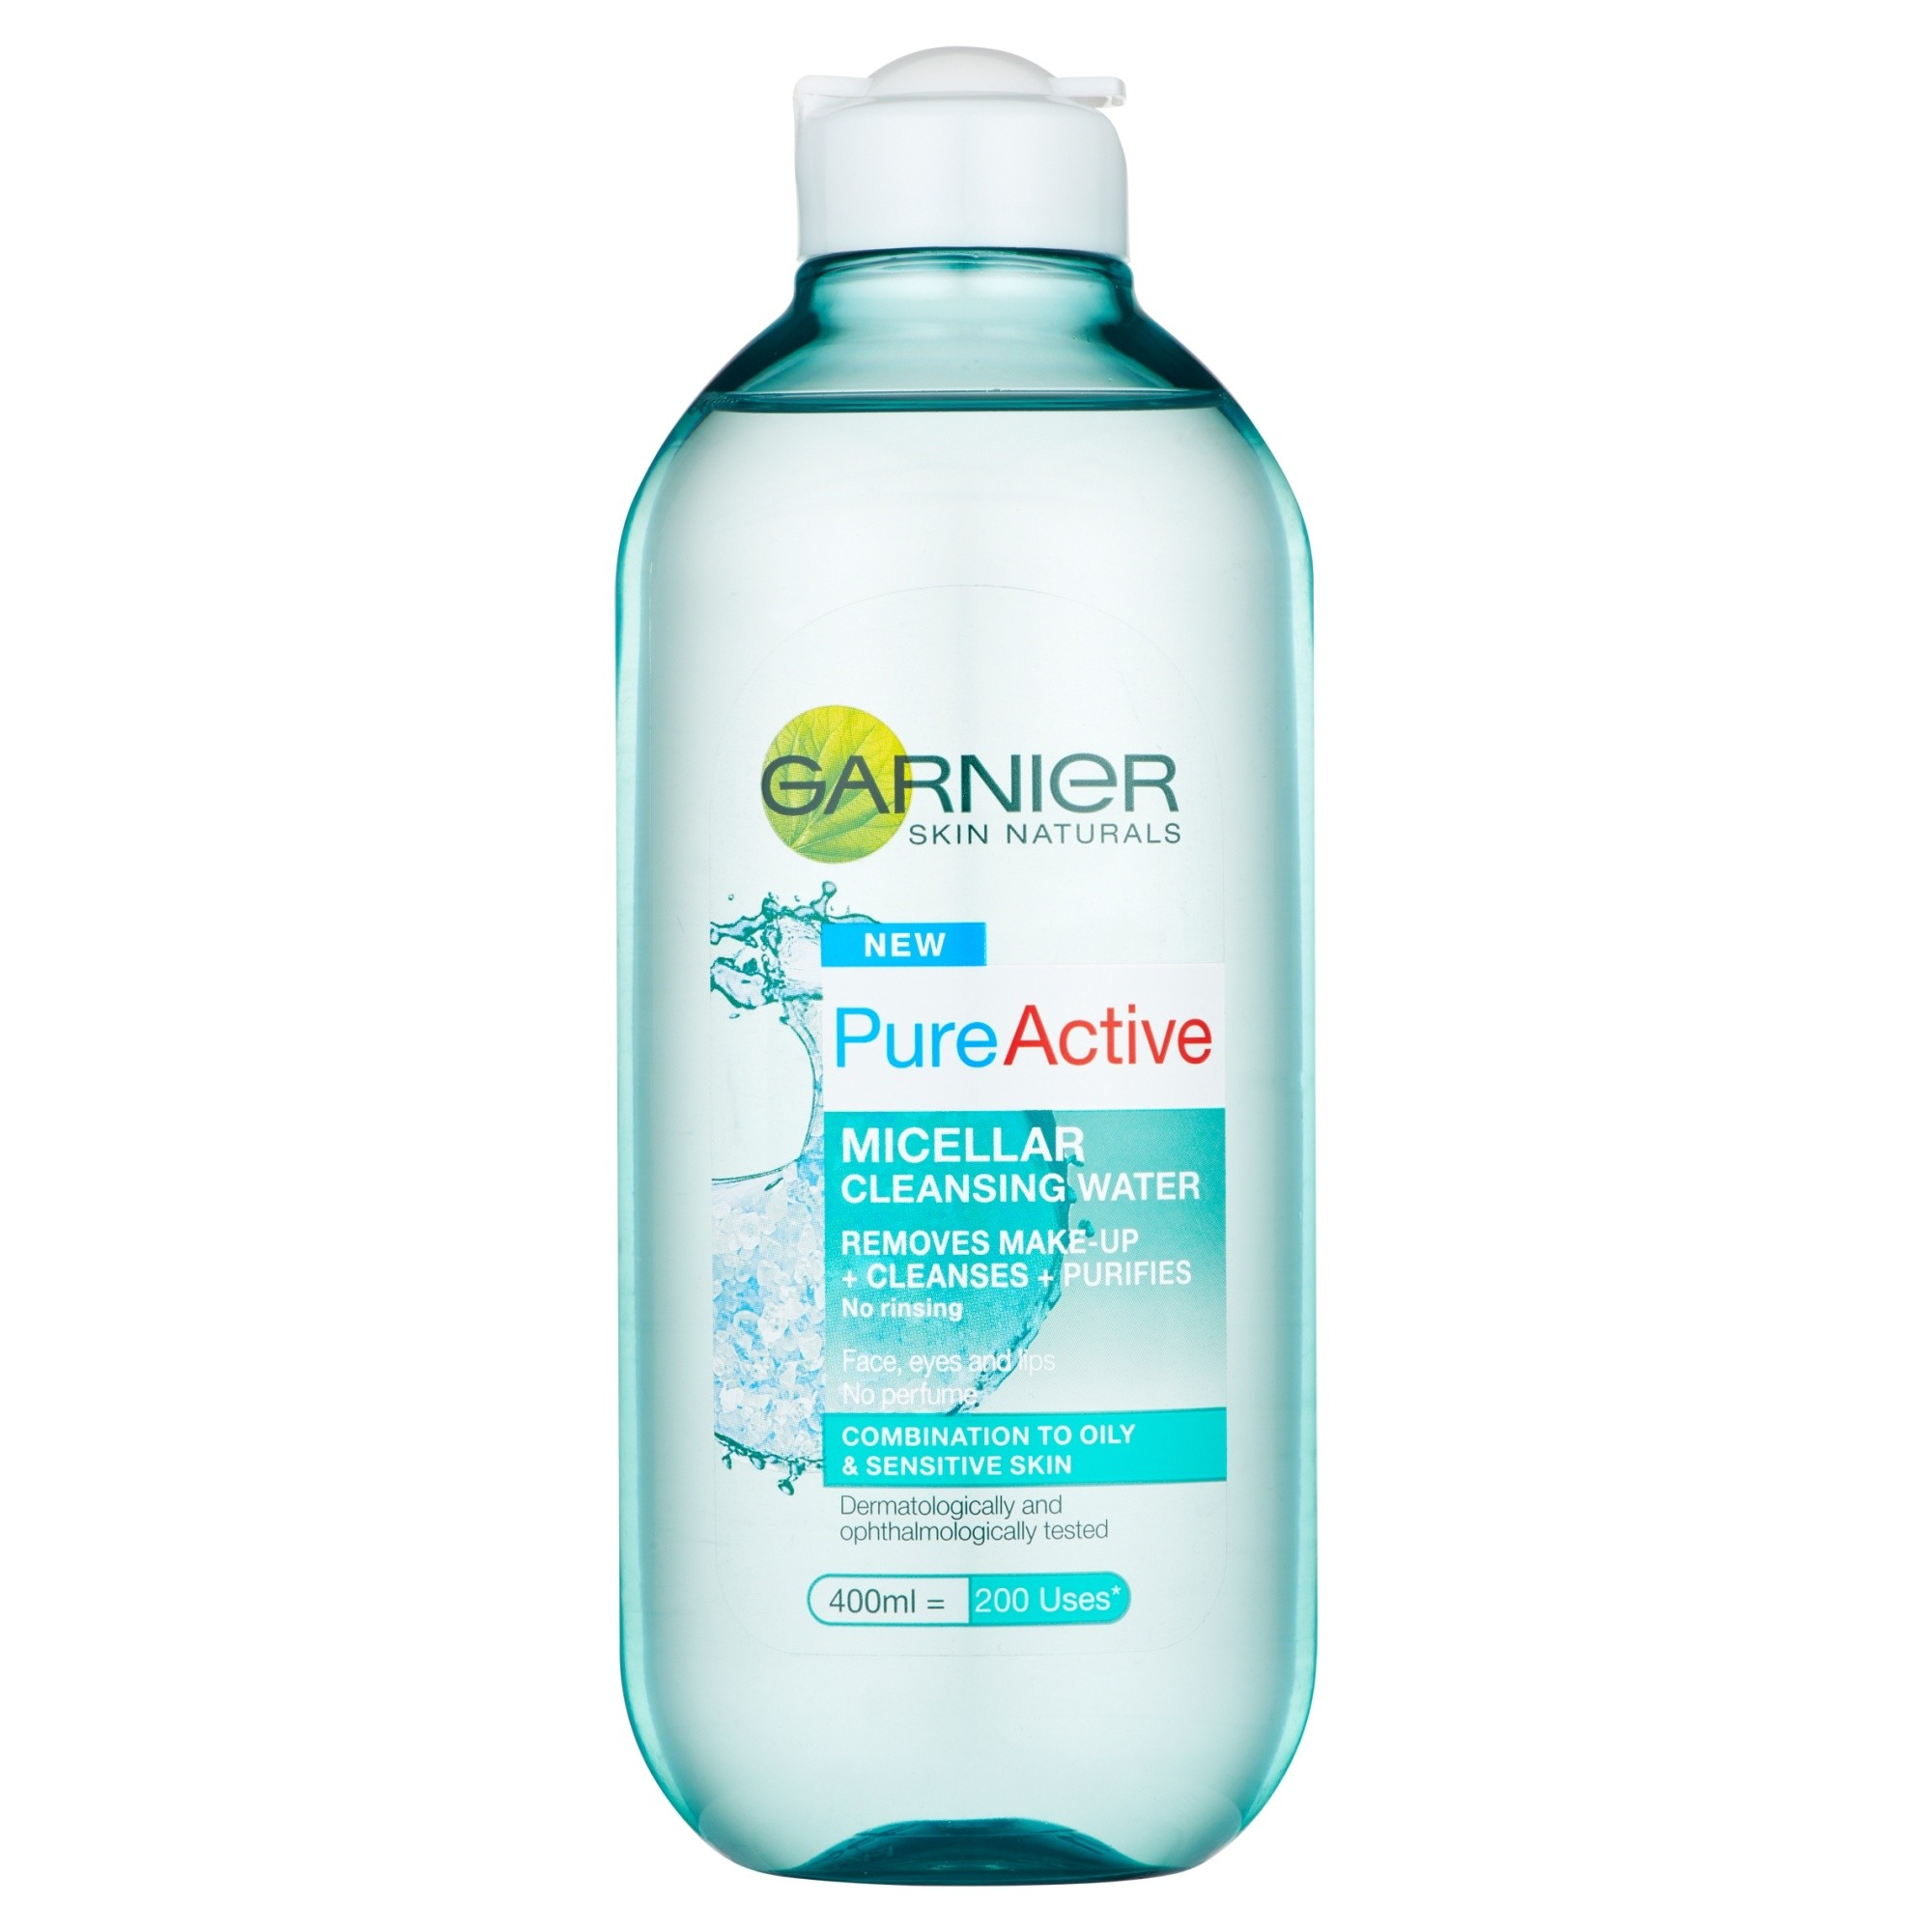 Garnier Pure Active Micellar Cleansing Water